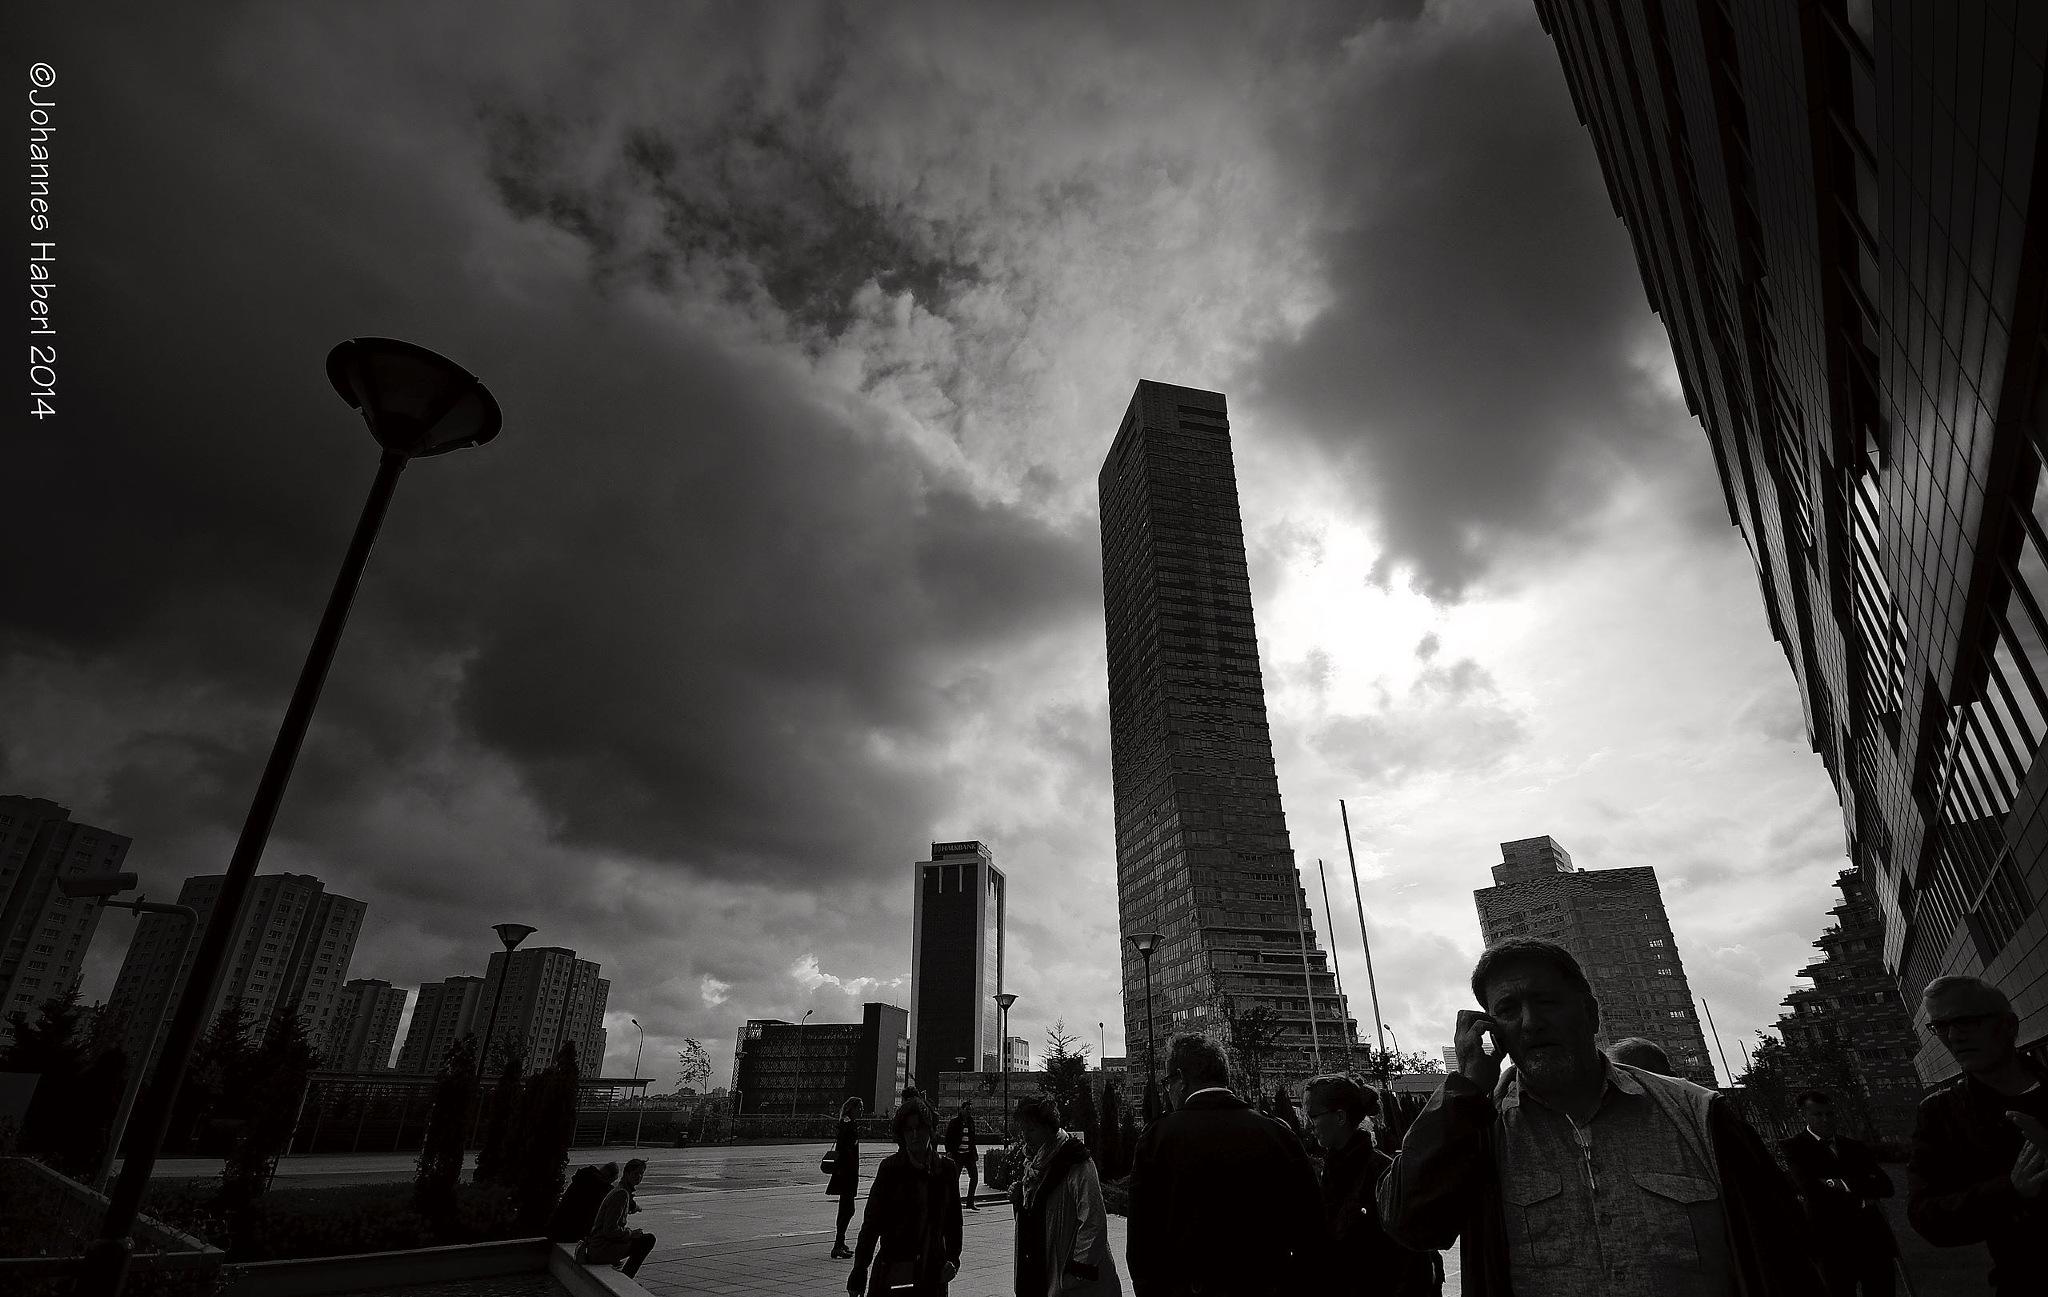 skyscraper Istanbul / B&W by Johannes Haberl